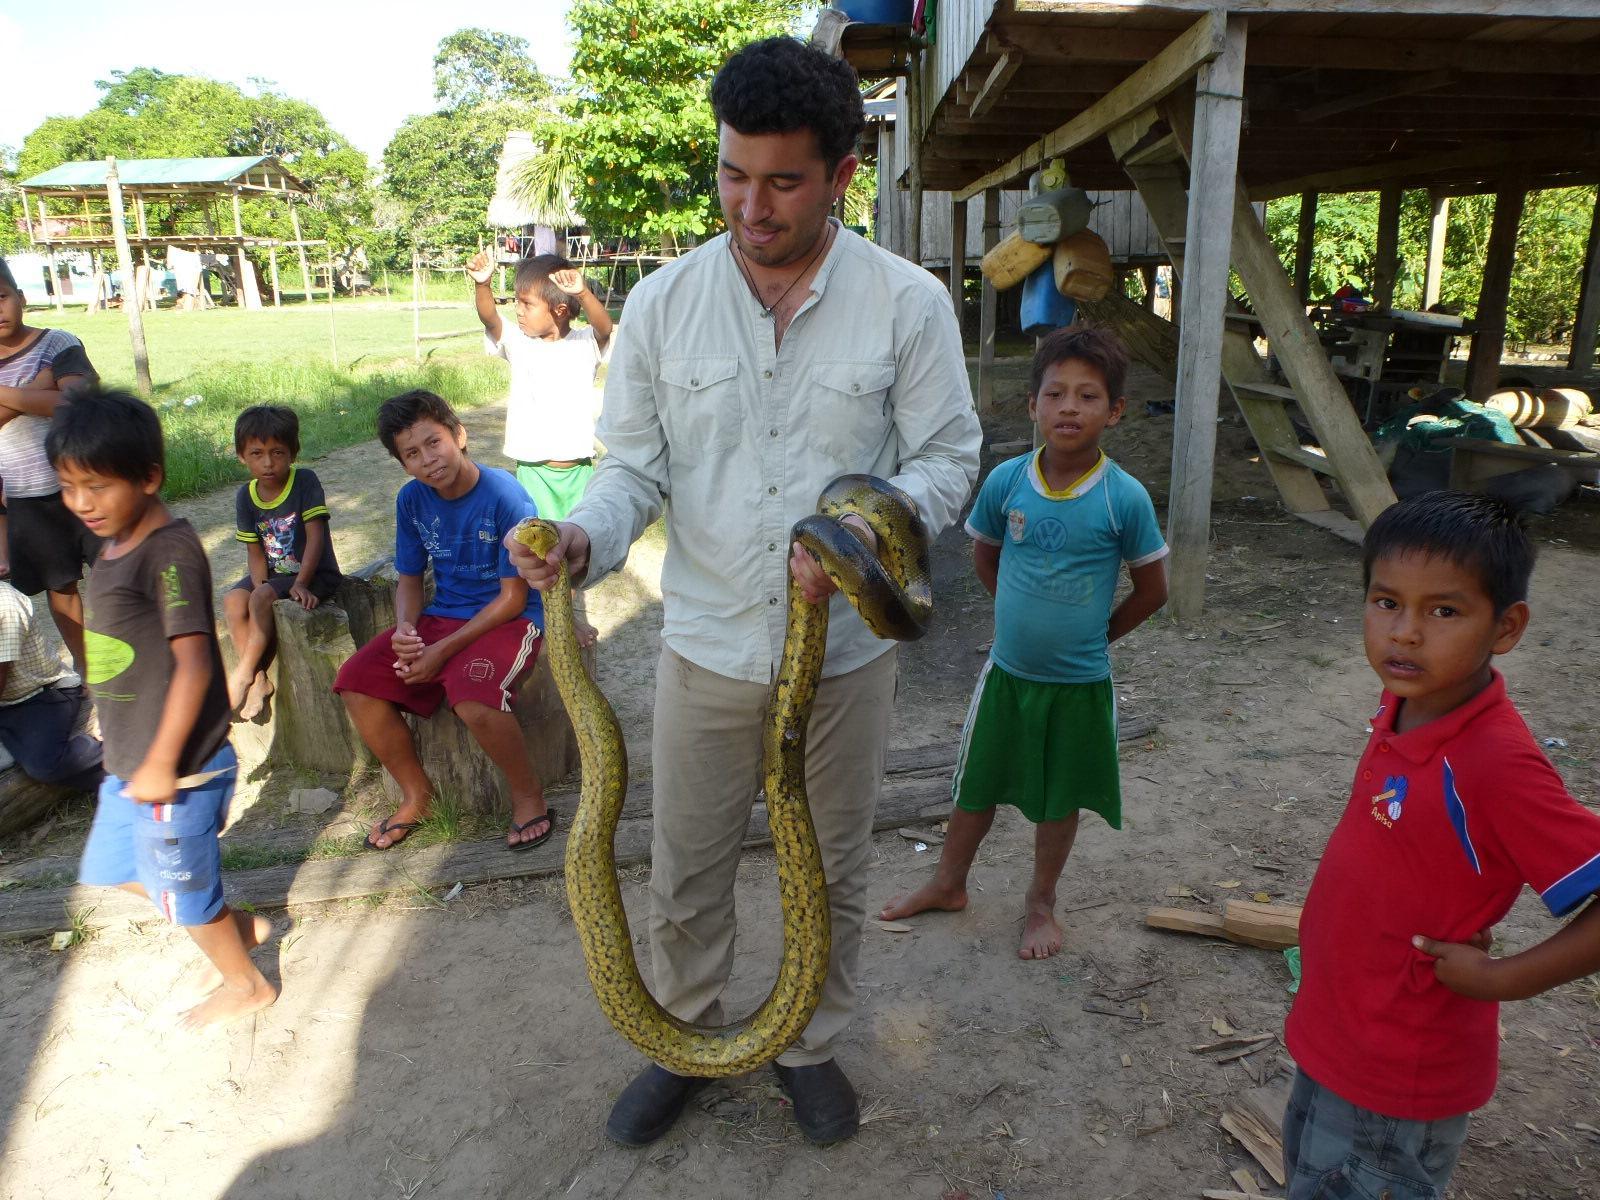 Ricardo Segovia with a boa and local children in Pacaya Samiria